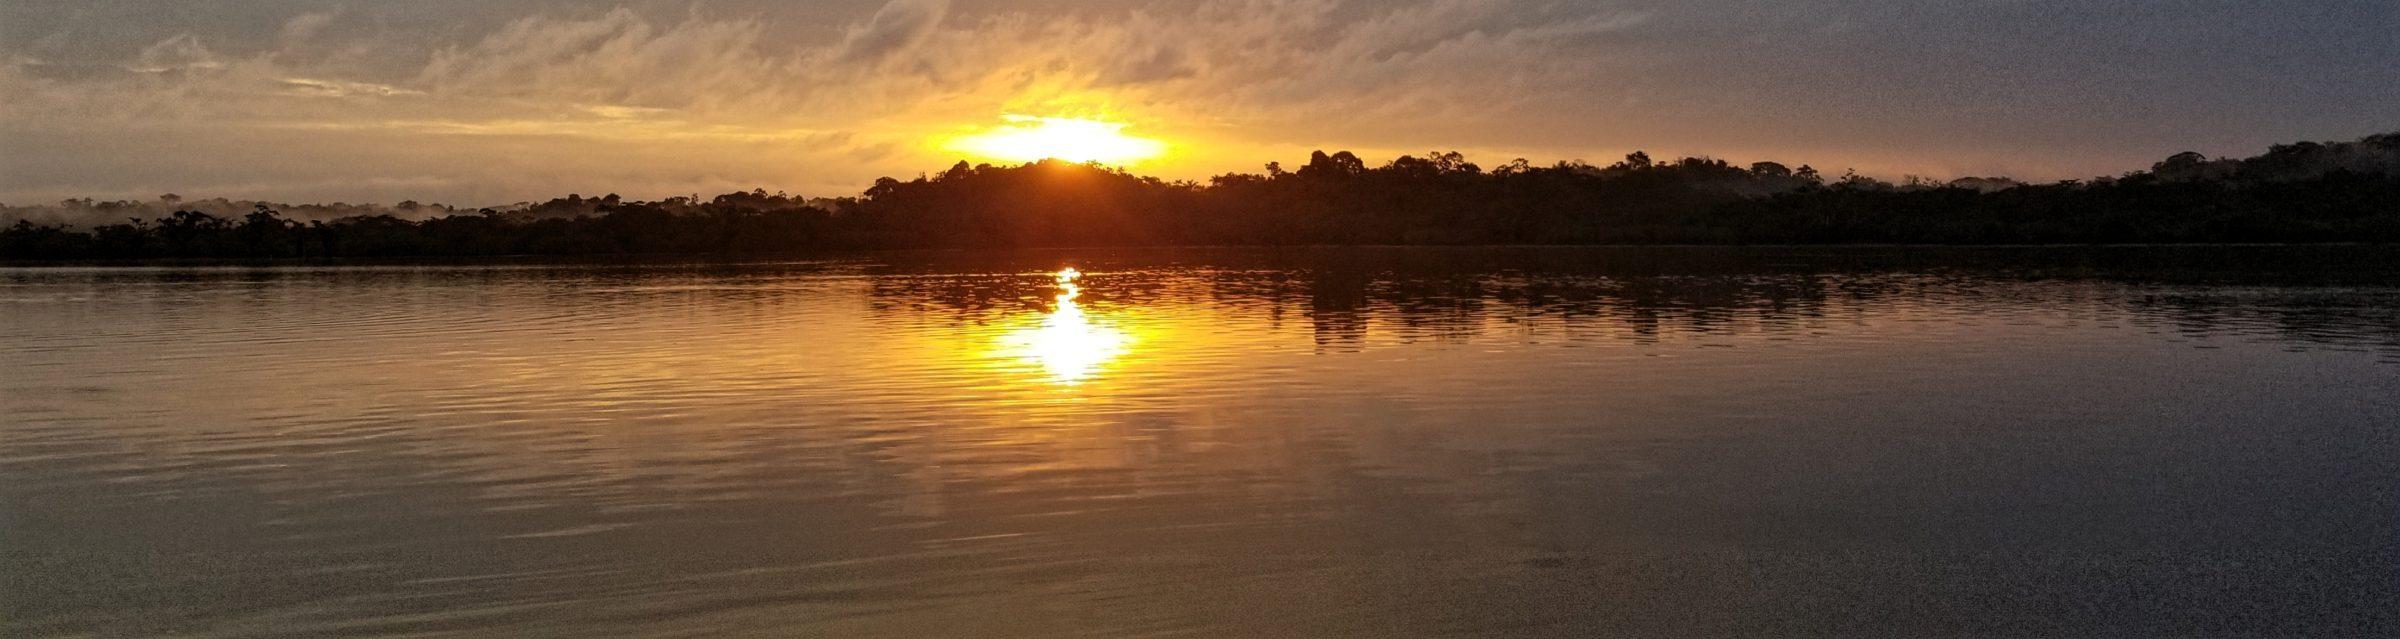 Cuyabeno — What to Expect in Ecuador's Amazon